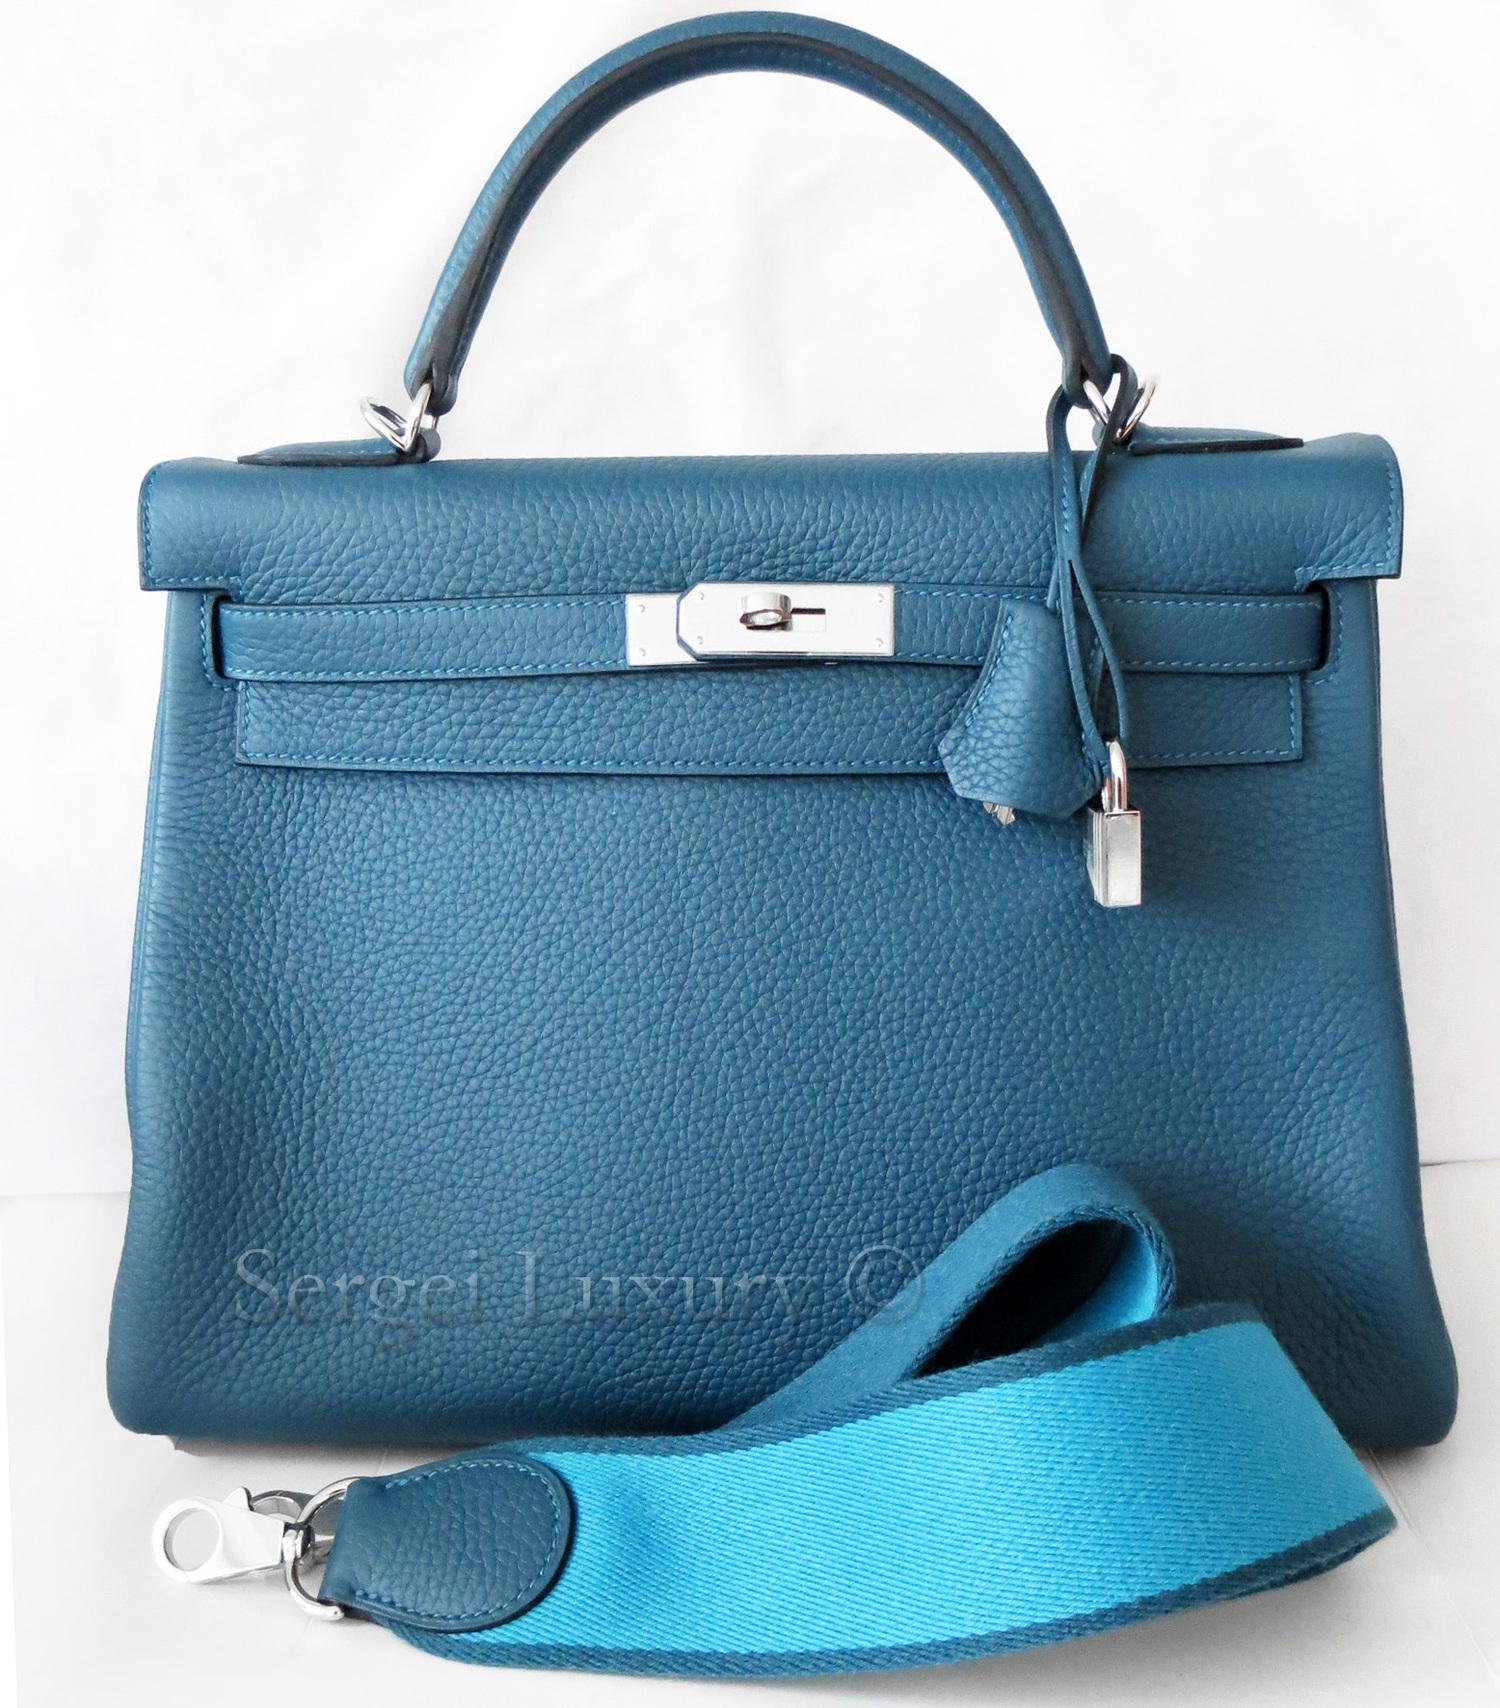 02c70ec4fbc2 Chic NEW Authentic HERMES Blue Tempete Amazone Canvas Strap Kelly bag 32 cm  PHW — Sergei Luxury